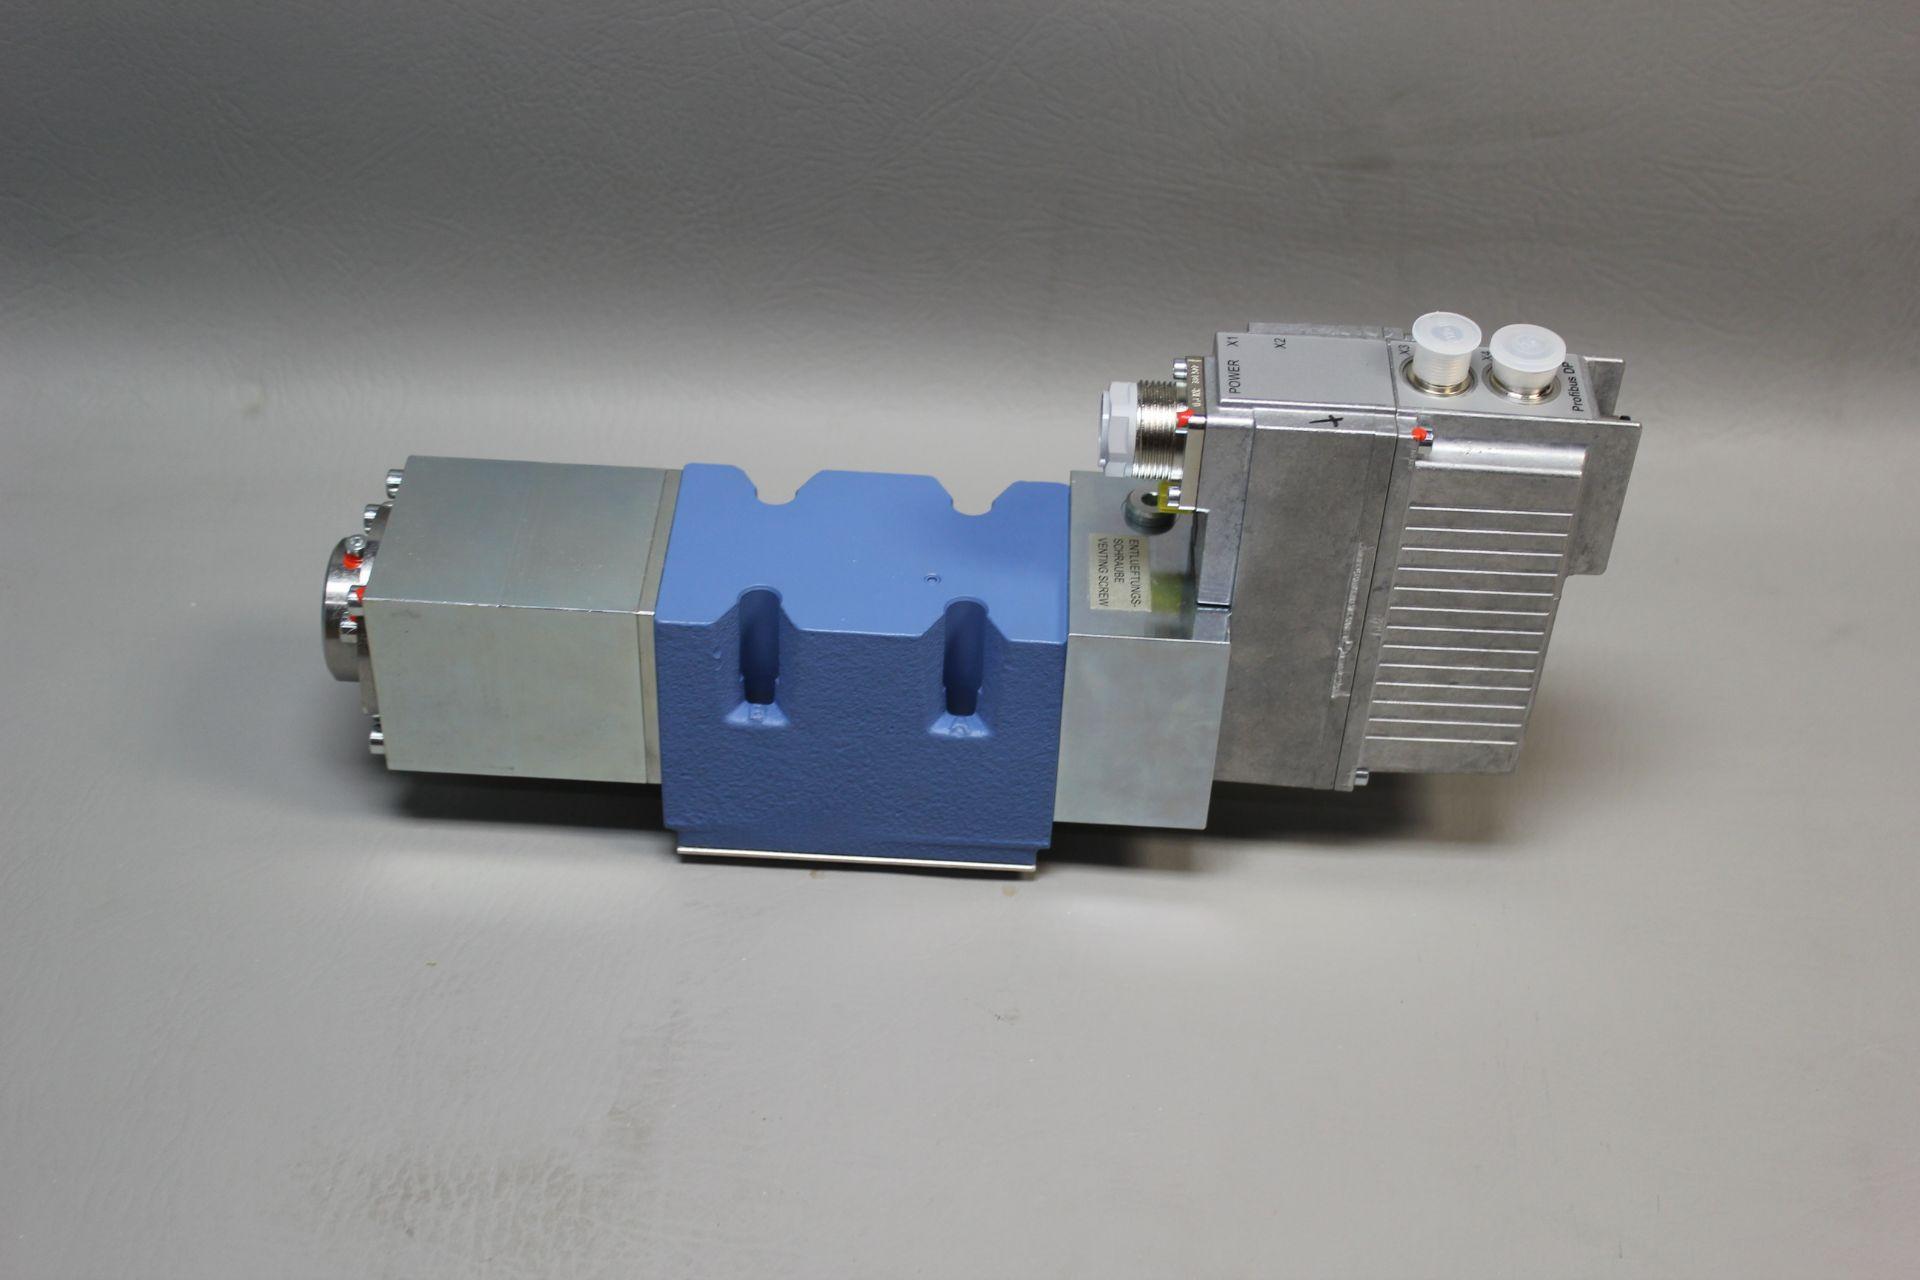 NEW MOOG DIRECT DRIVE DIGITAL CONTROL HYDRAULIC SERVO VALVE - Image 12 of 15